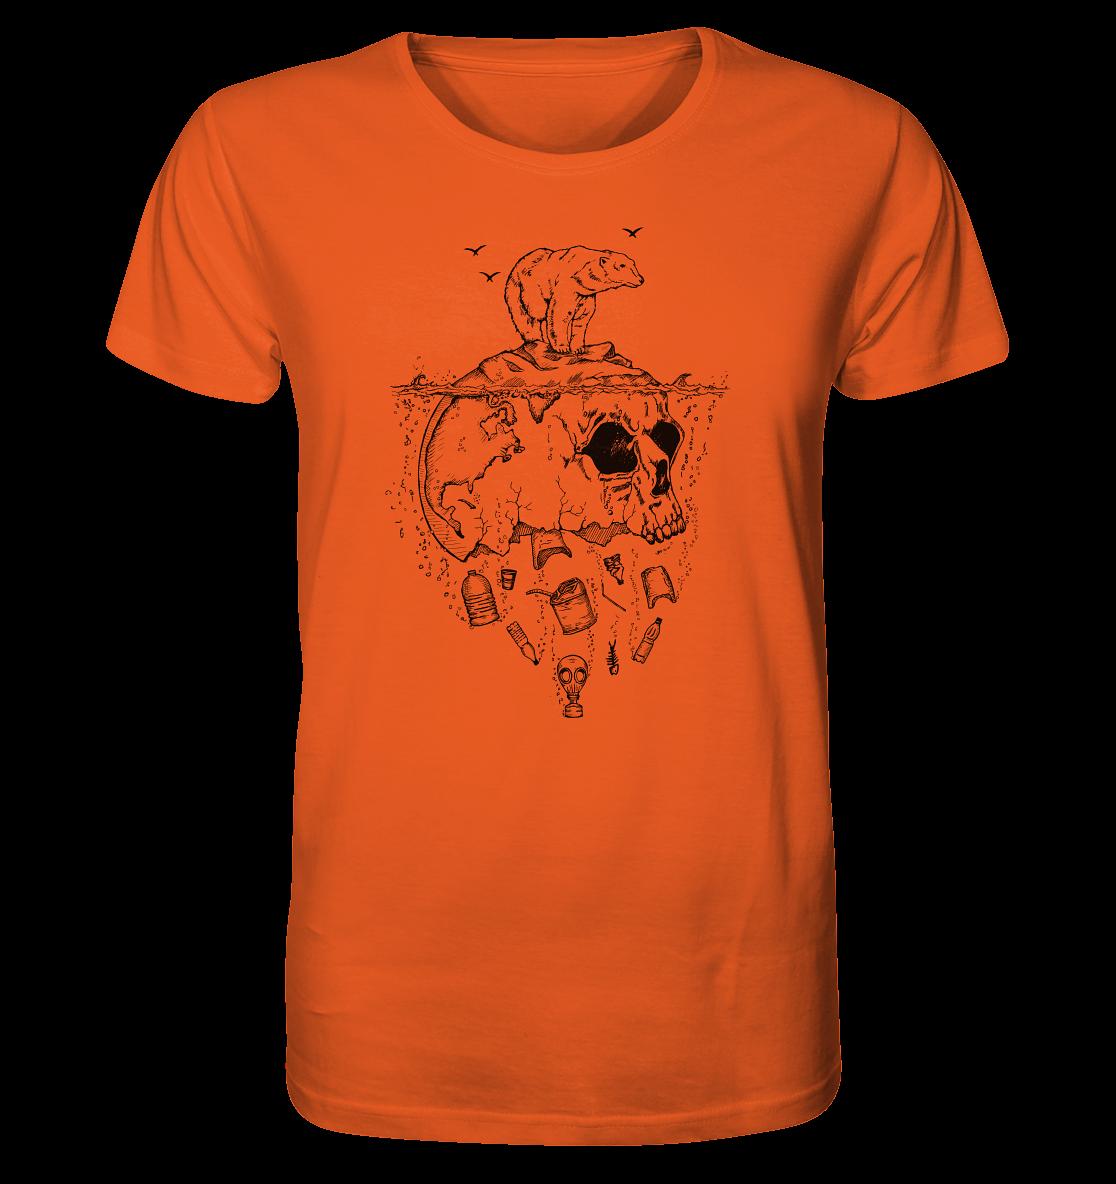 front-organic-shirt-ea5b23-1116x-5.png